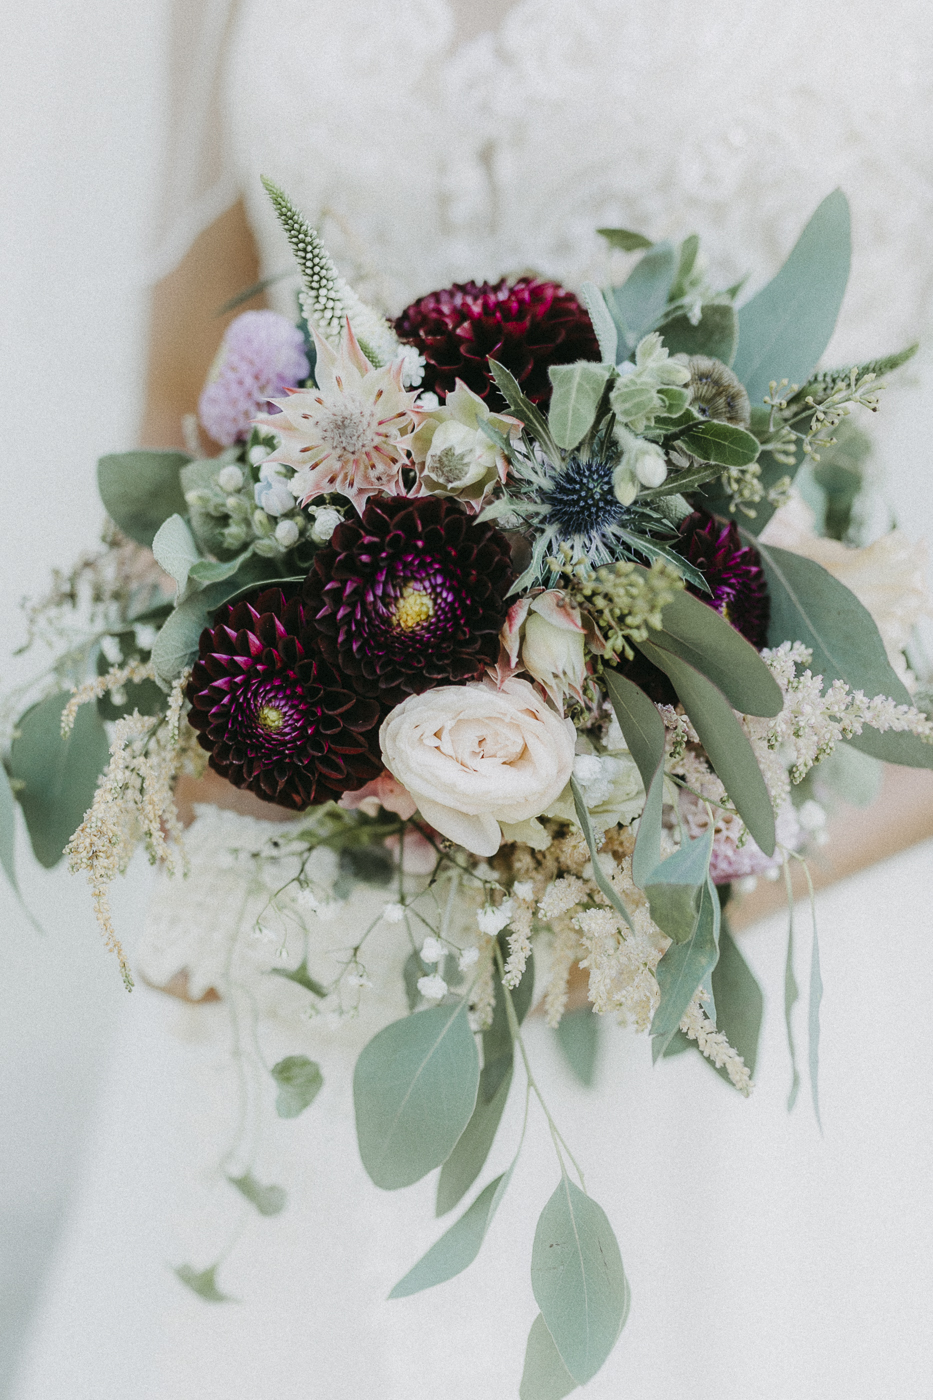 rosemarrylemon_ND_Hochzeit_Hochzeitsplanung11.jpg